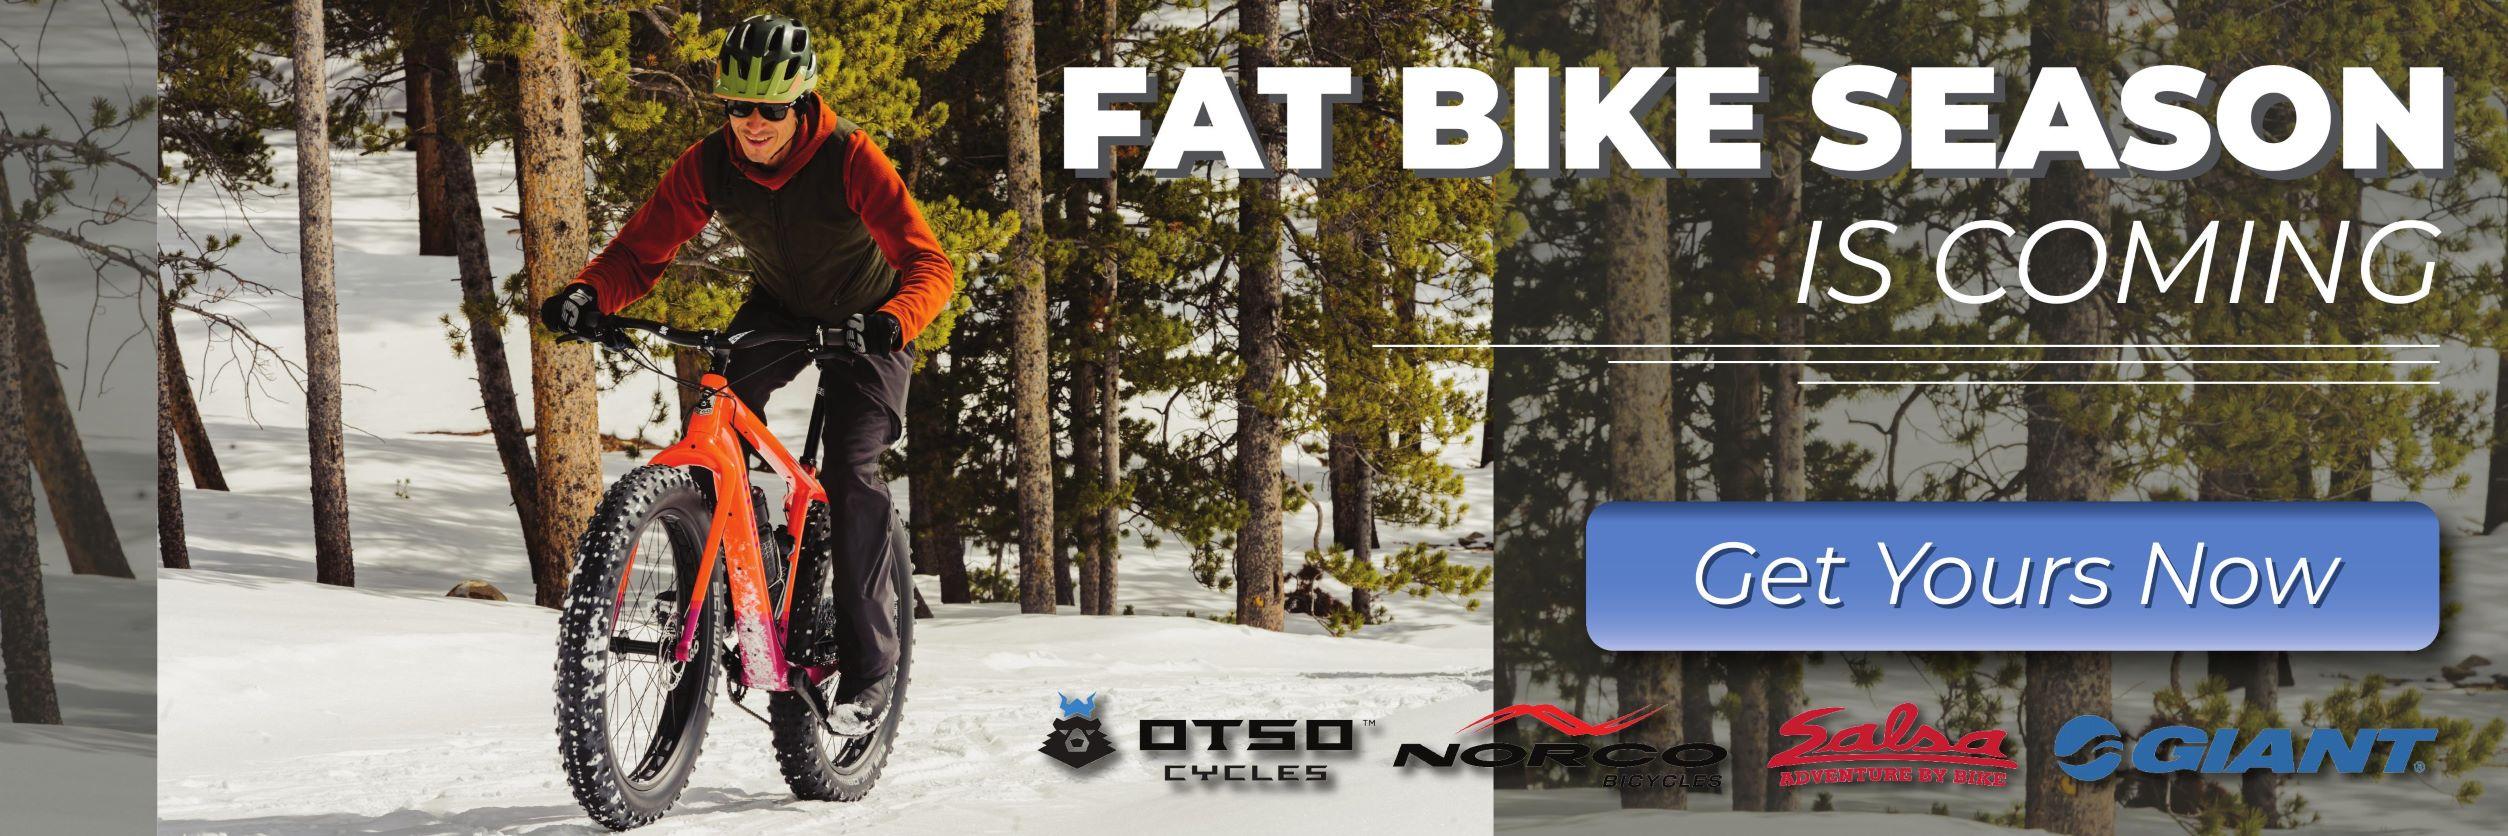 Fat Bike Season is Coming